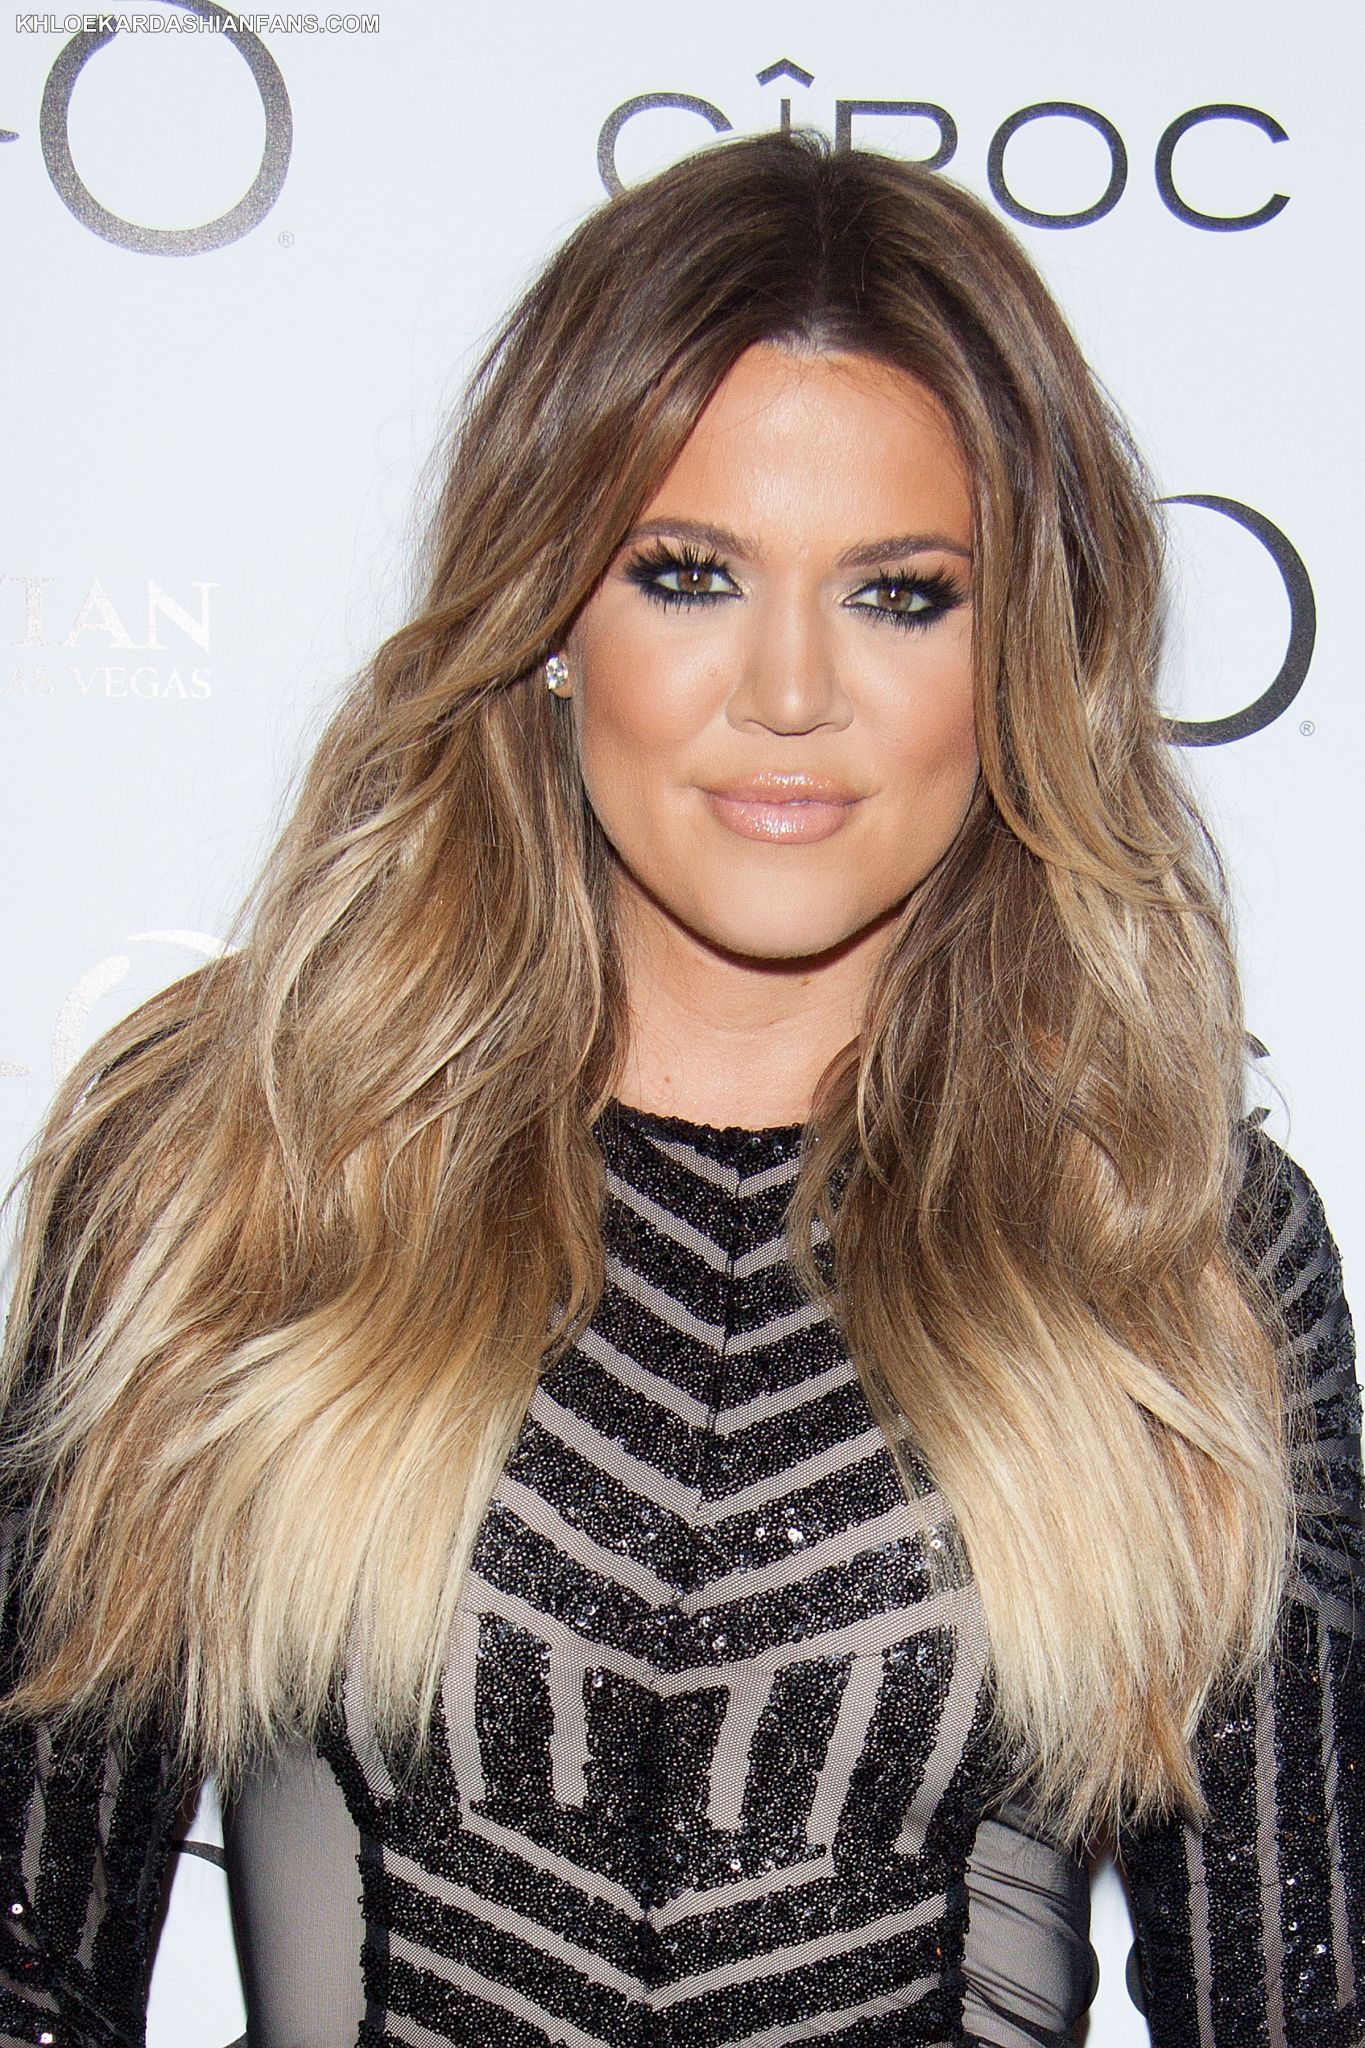 Khloe Kardashian Ombre Hair 30th Birthday At Tao Las